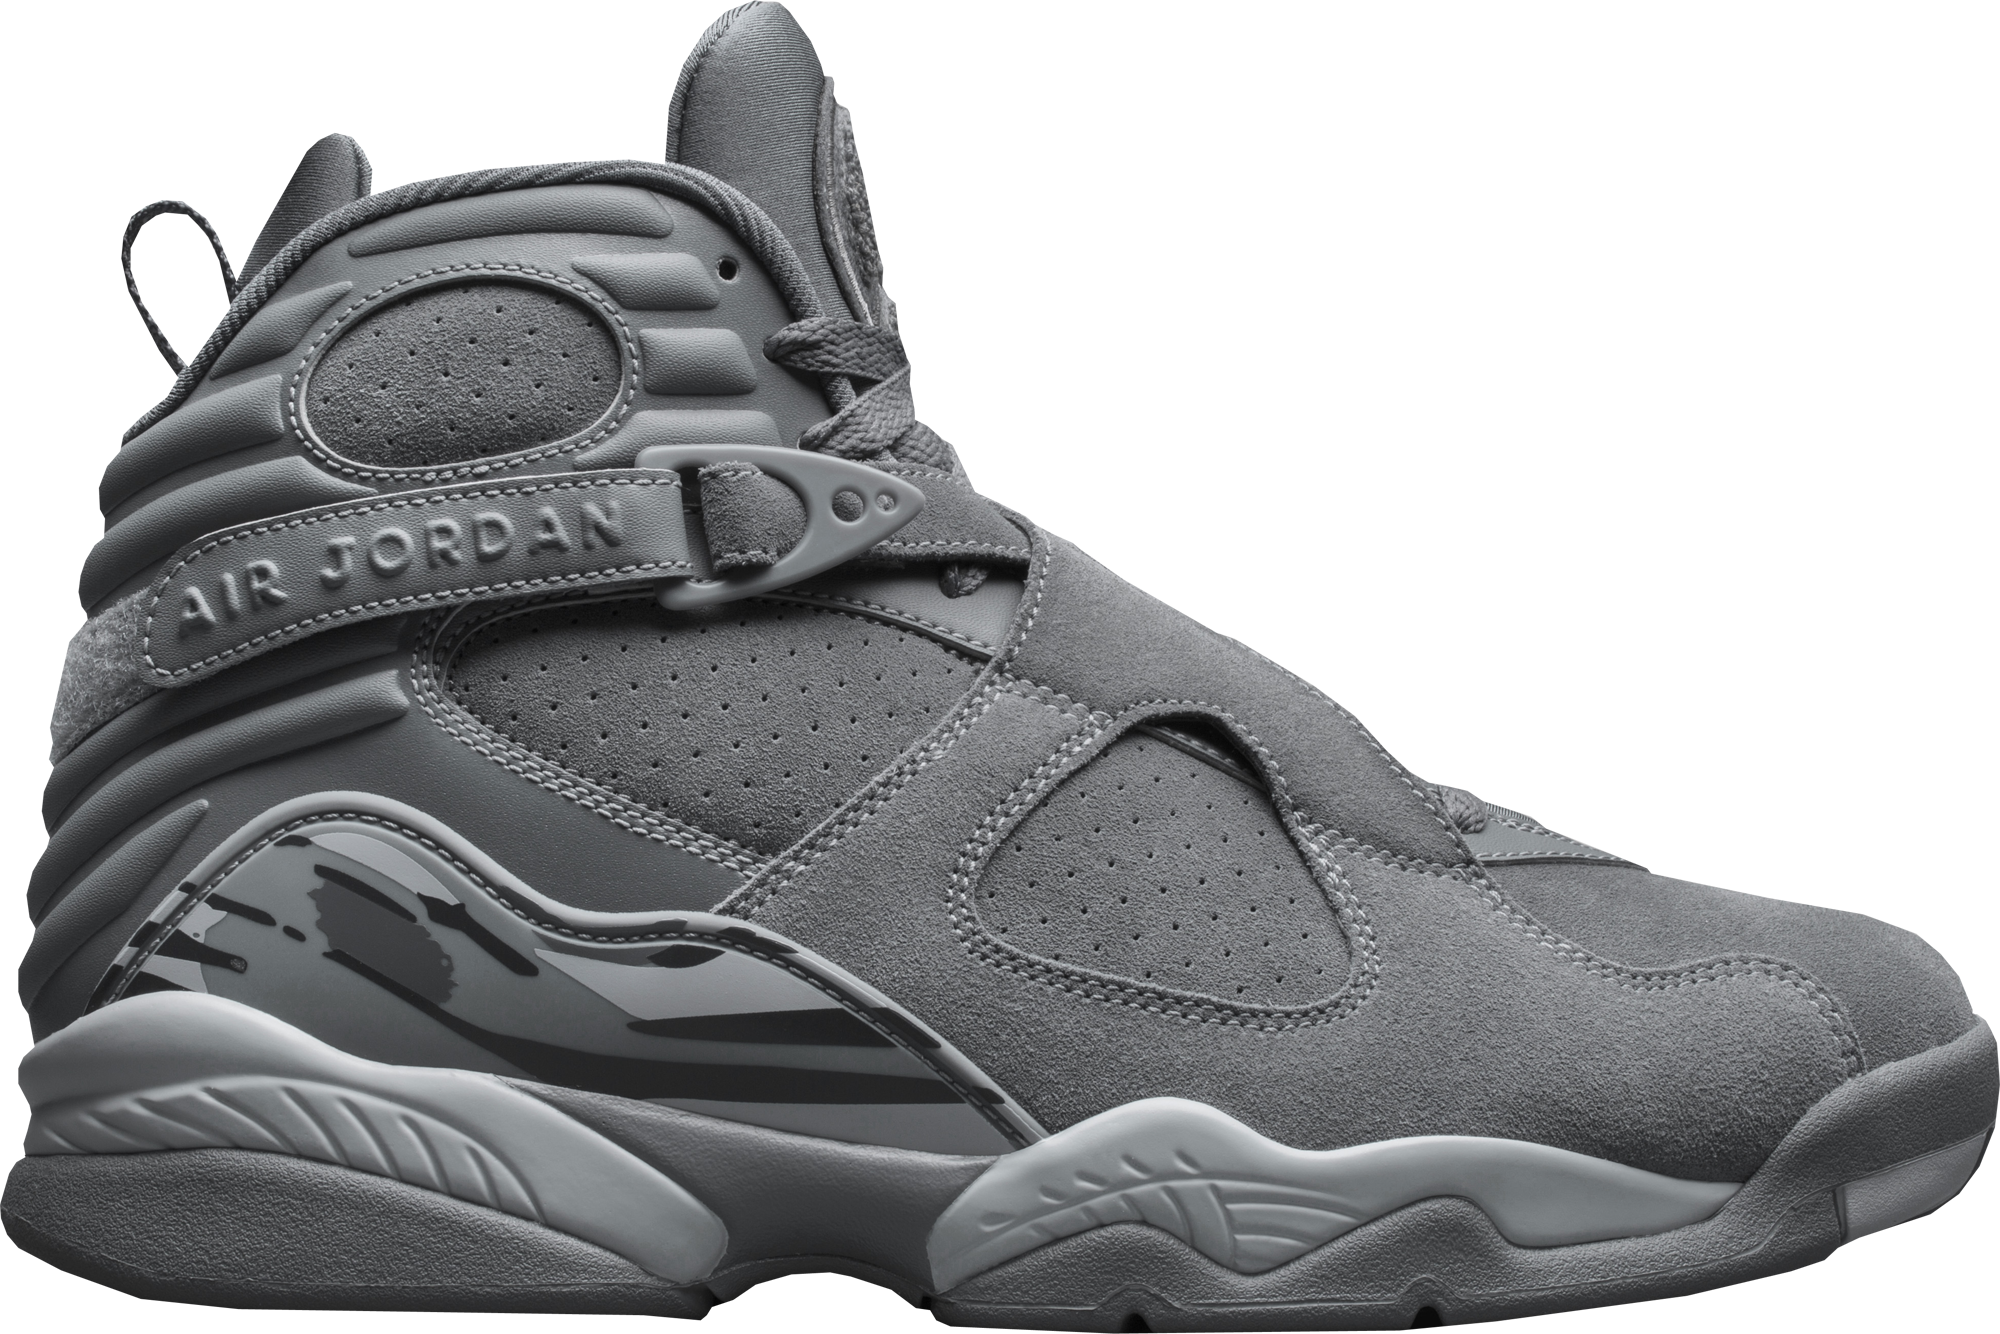 b42027e57f9 Jordan 8 Retro Cool Grey in 2019 | basket | Pinterest | Sneakers ...